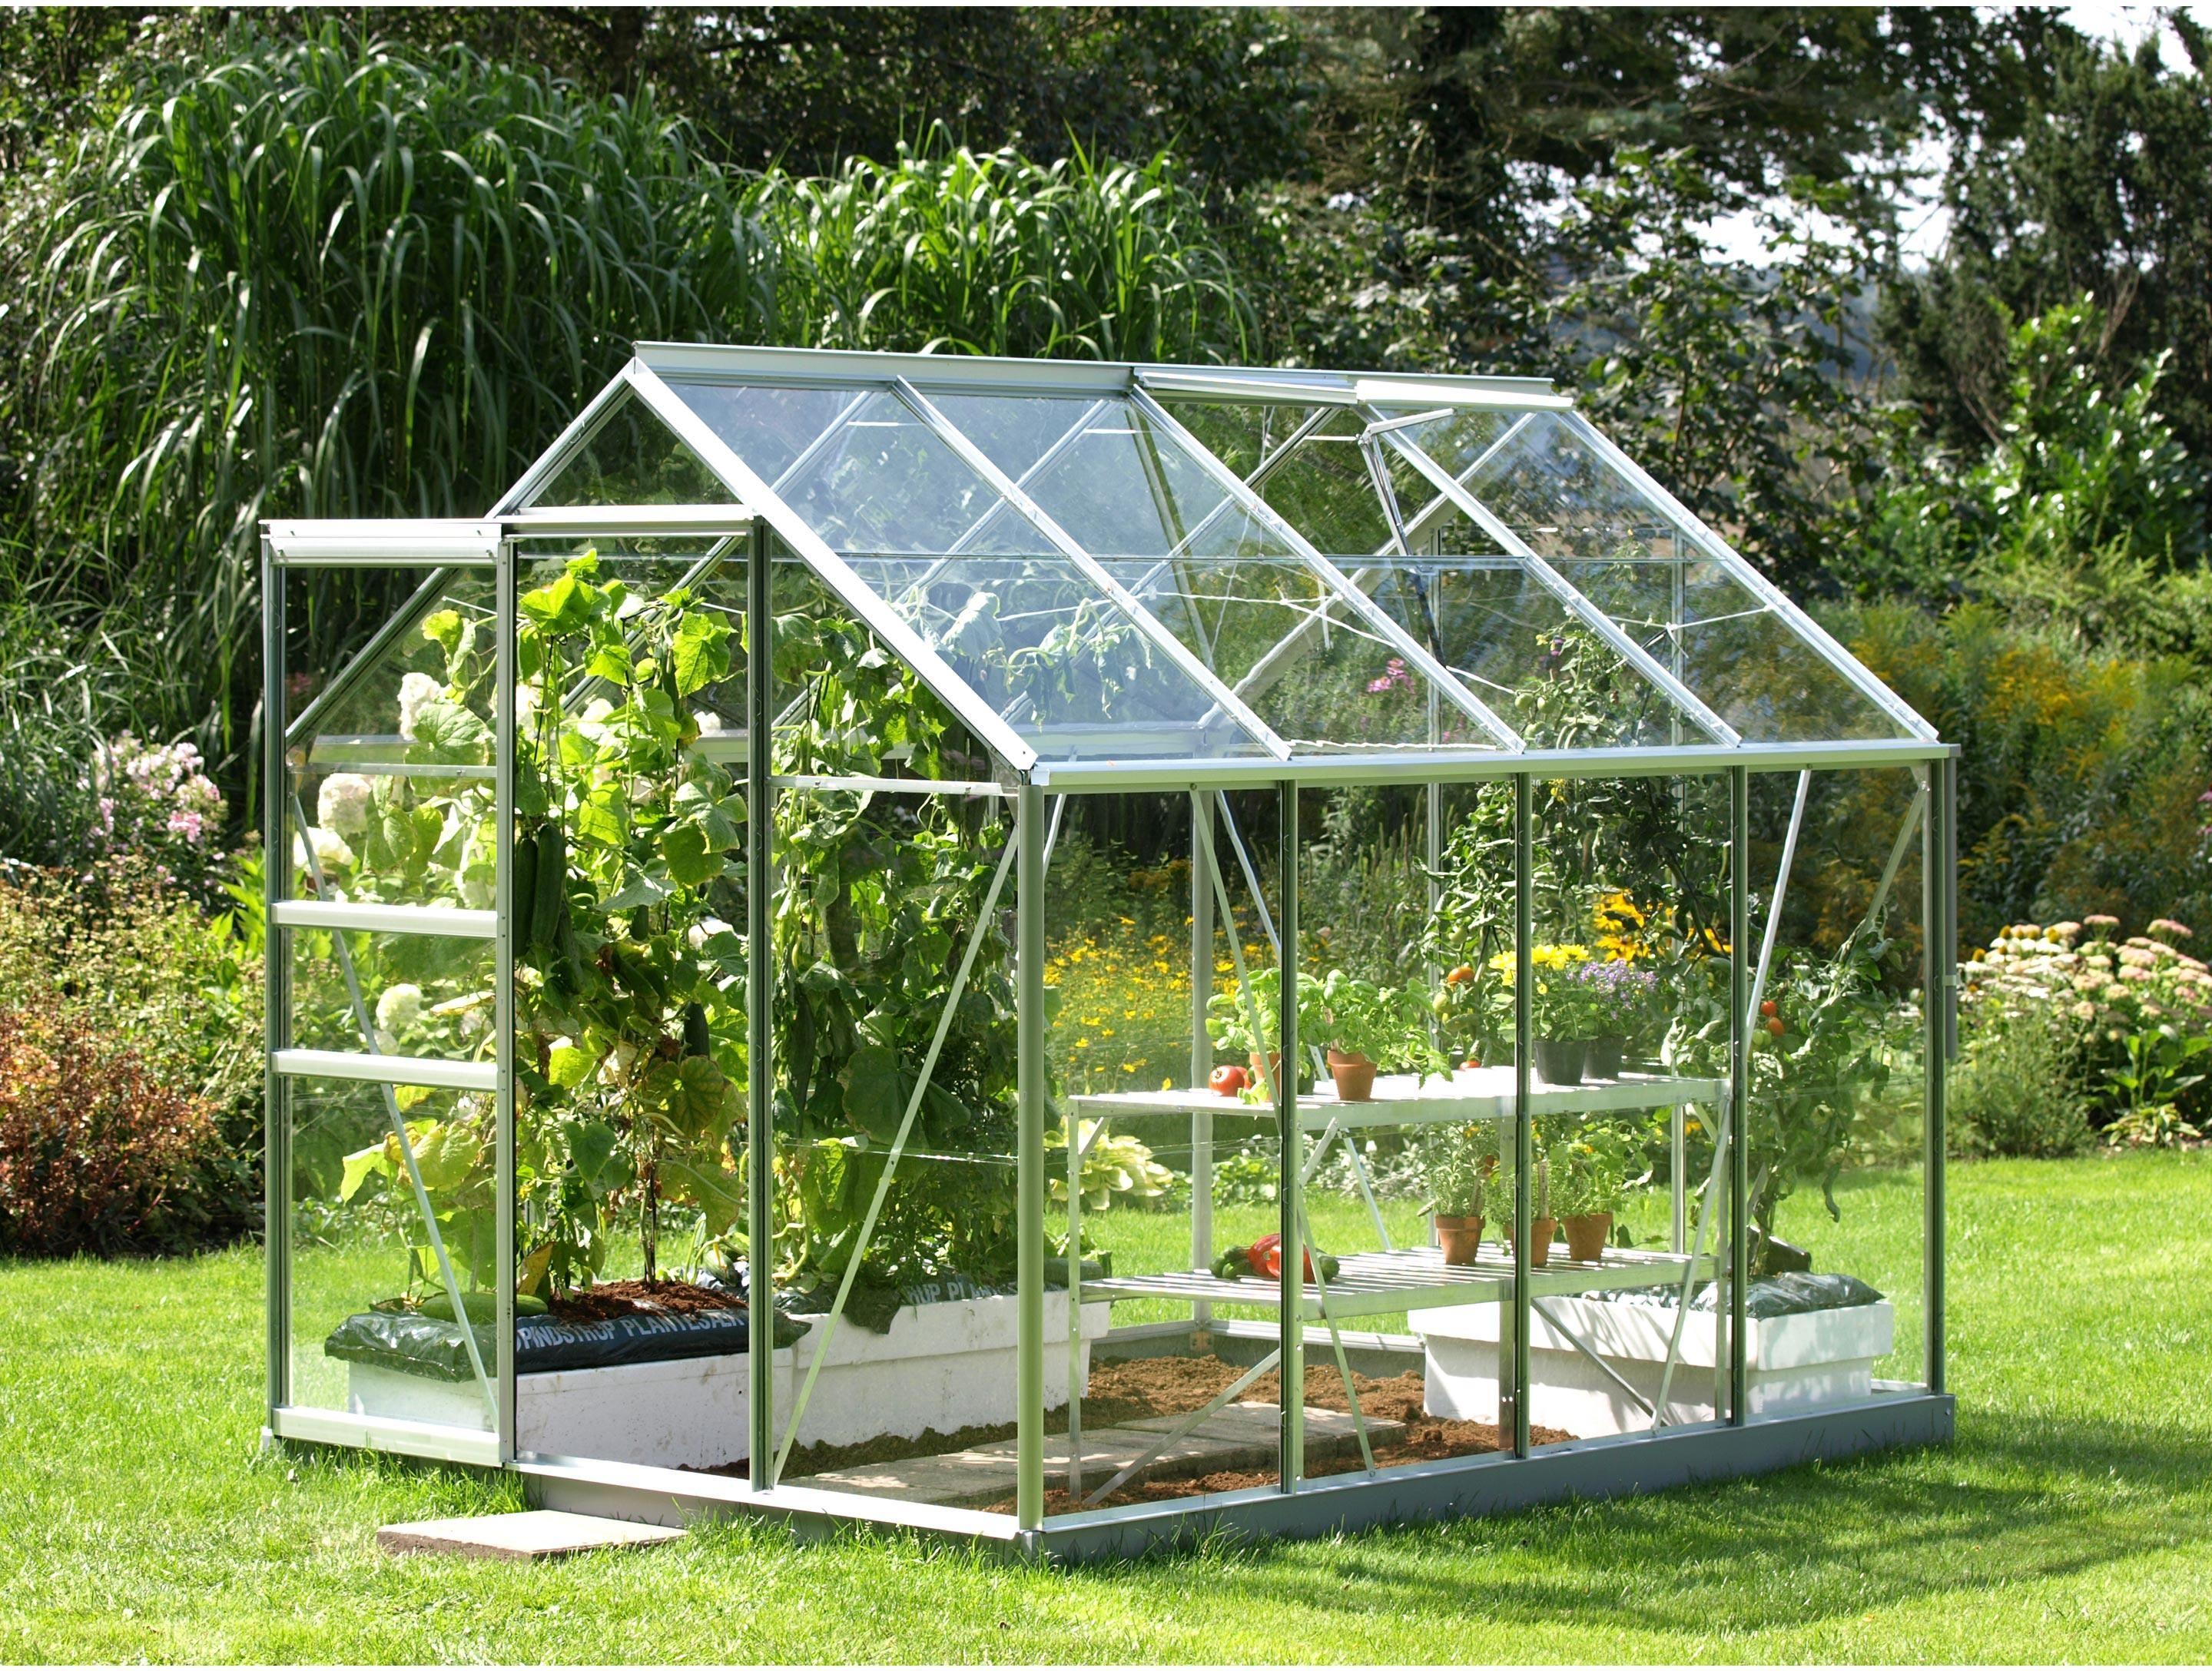 Serre De Jardin En Verre Trempe 3 Mm Lams Allium Venus 5000 Alu 4 96 M Lams En 2020 Maison Verte Plans De Serre Et Construire Une Serre